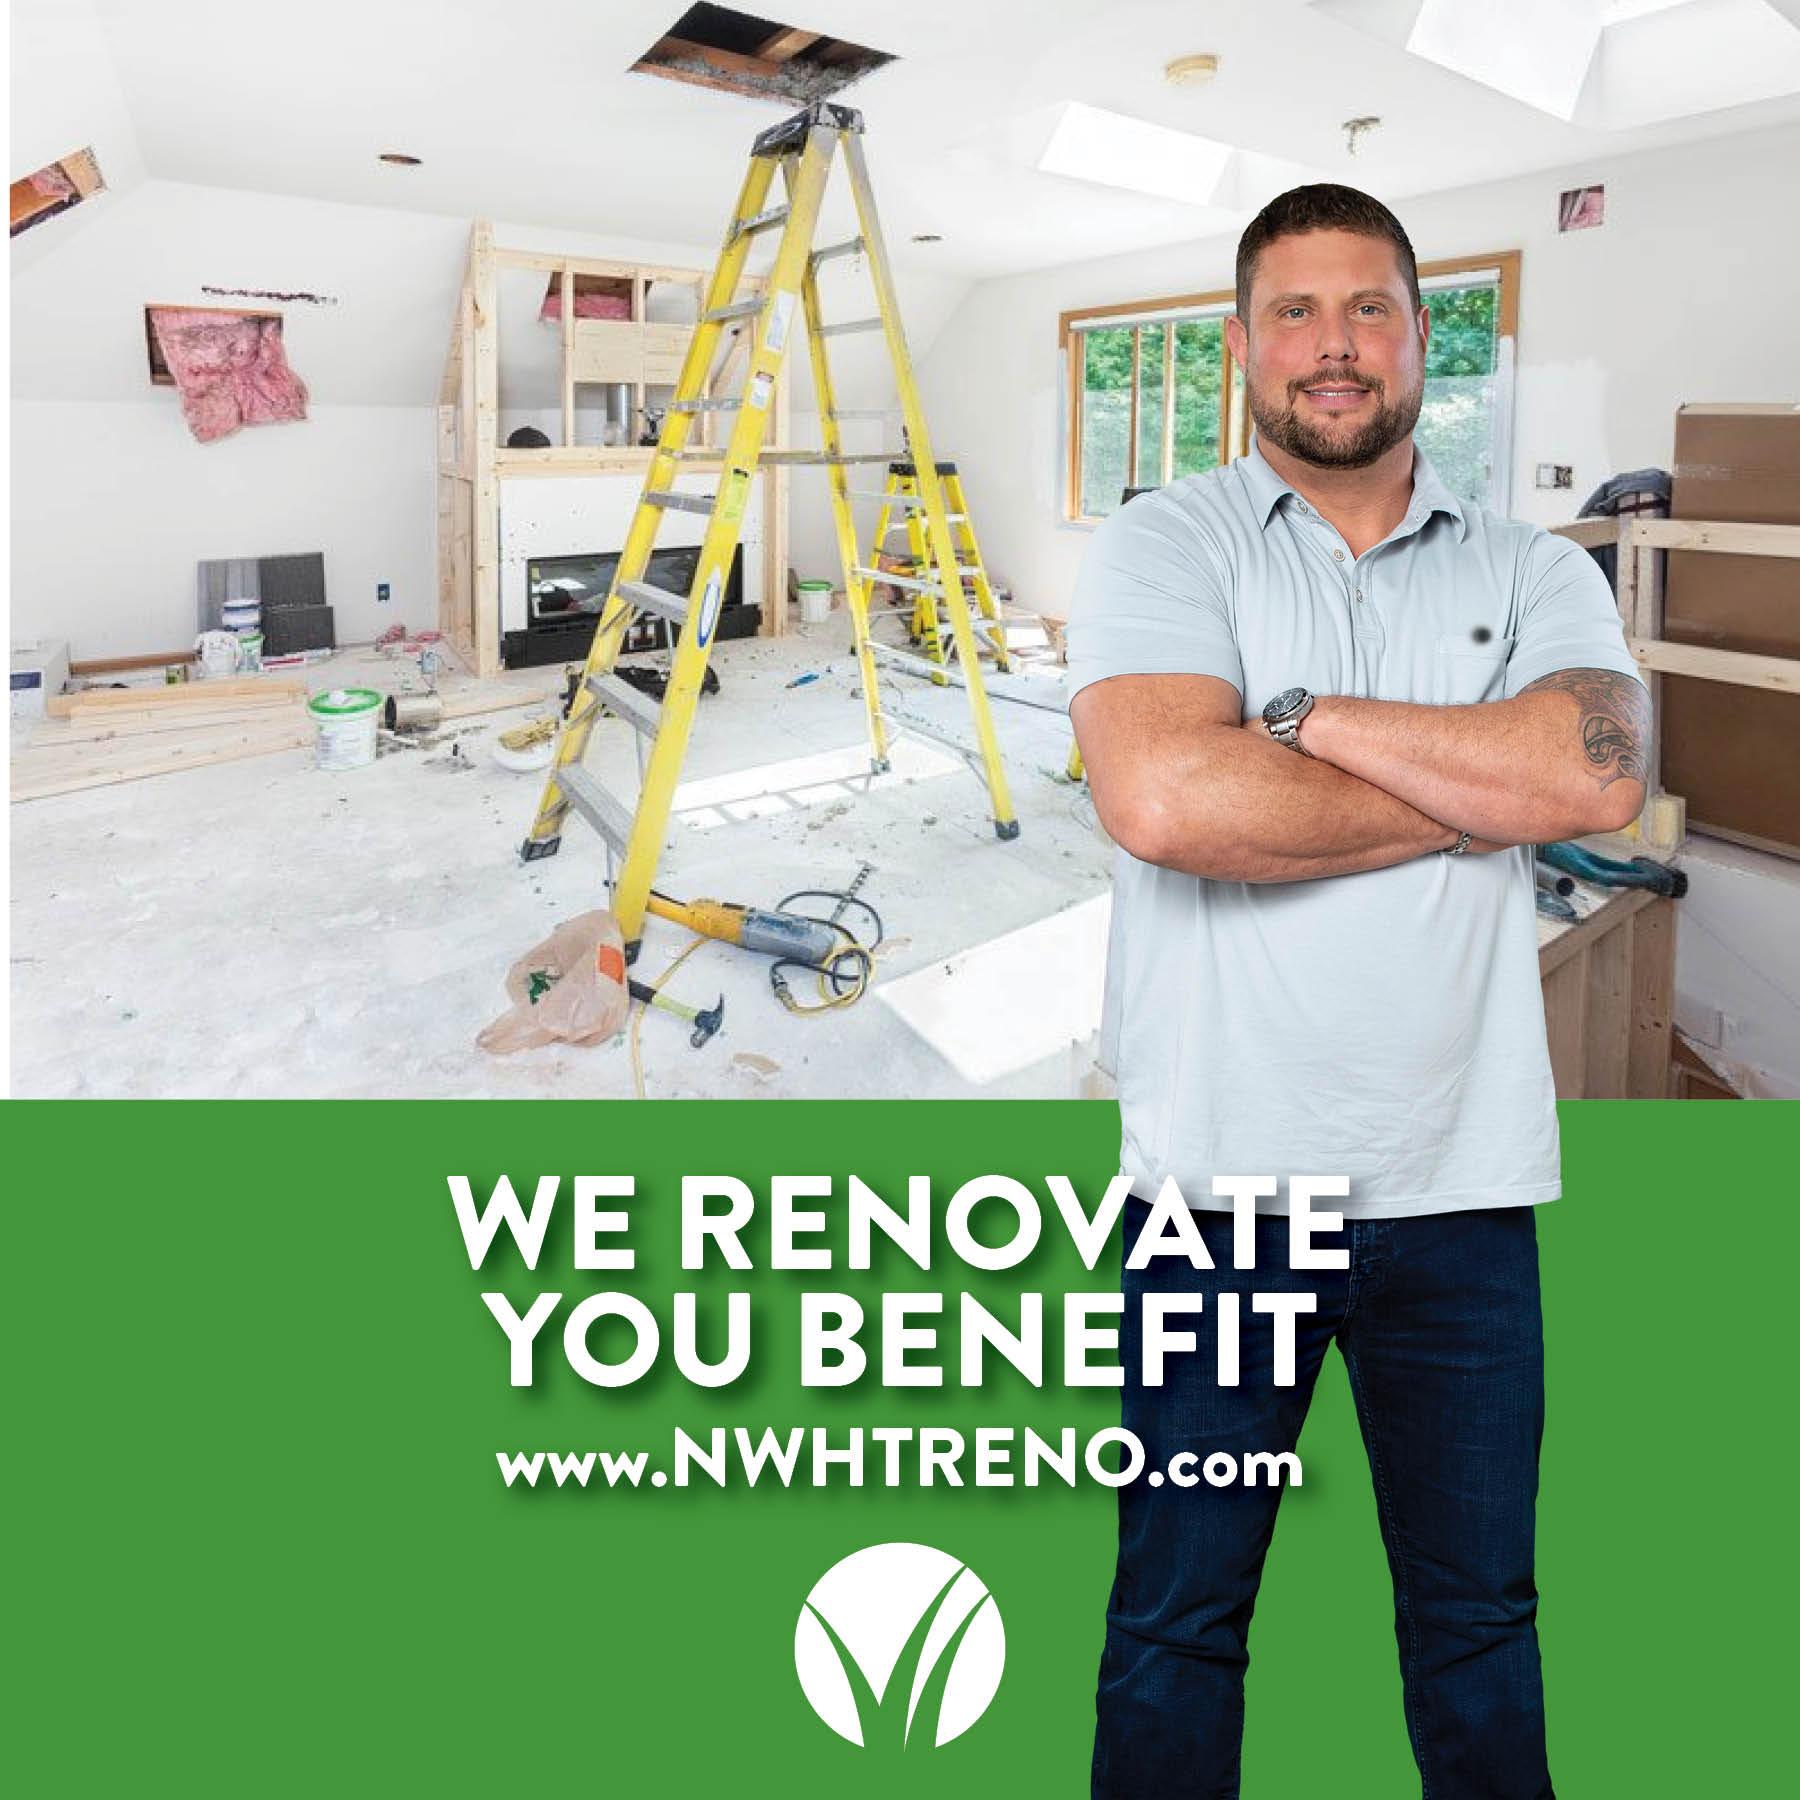 We Renovate • You Benefit